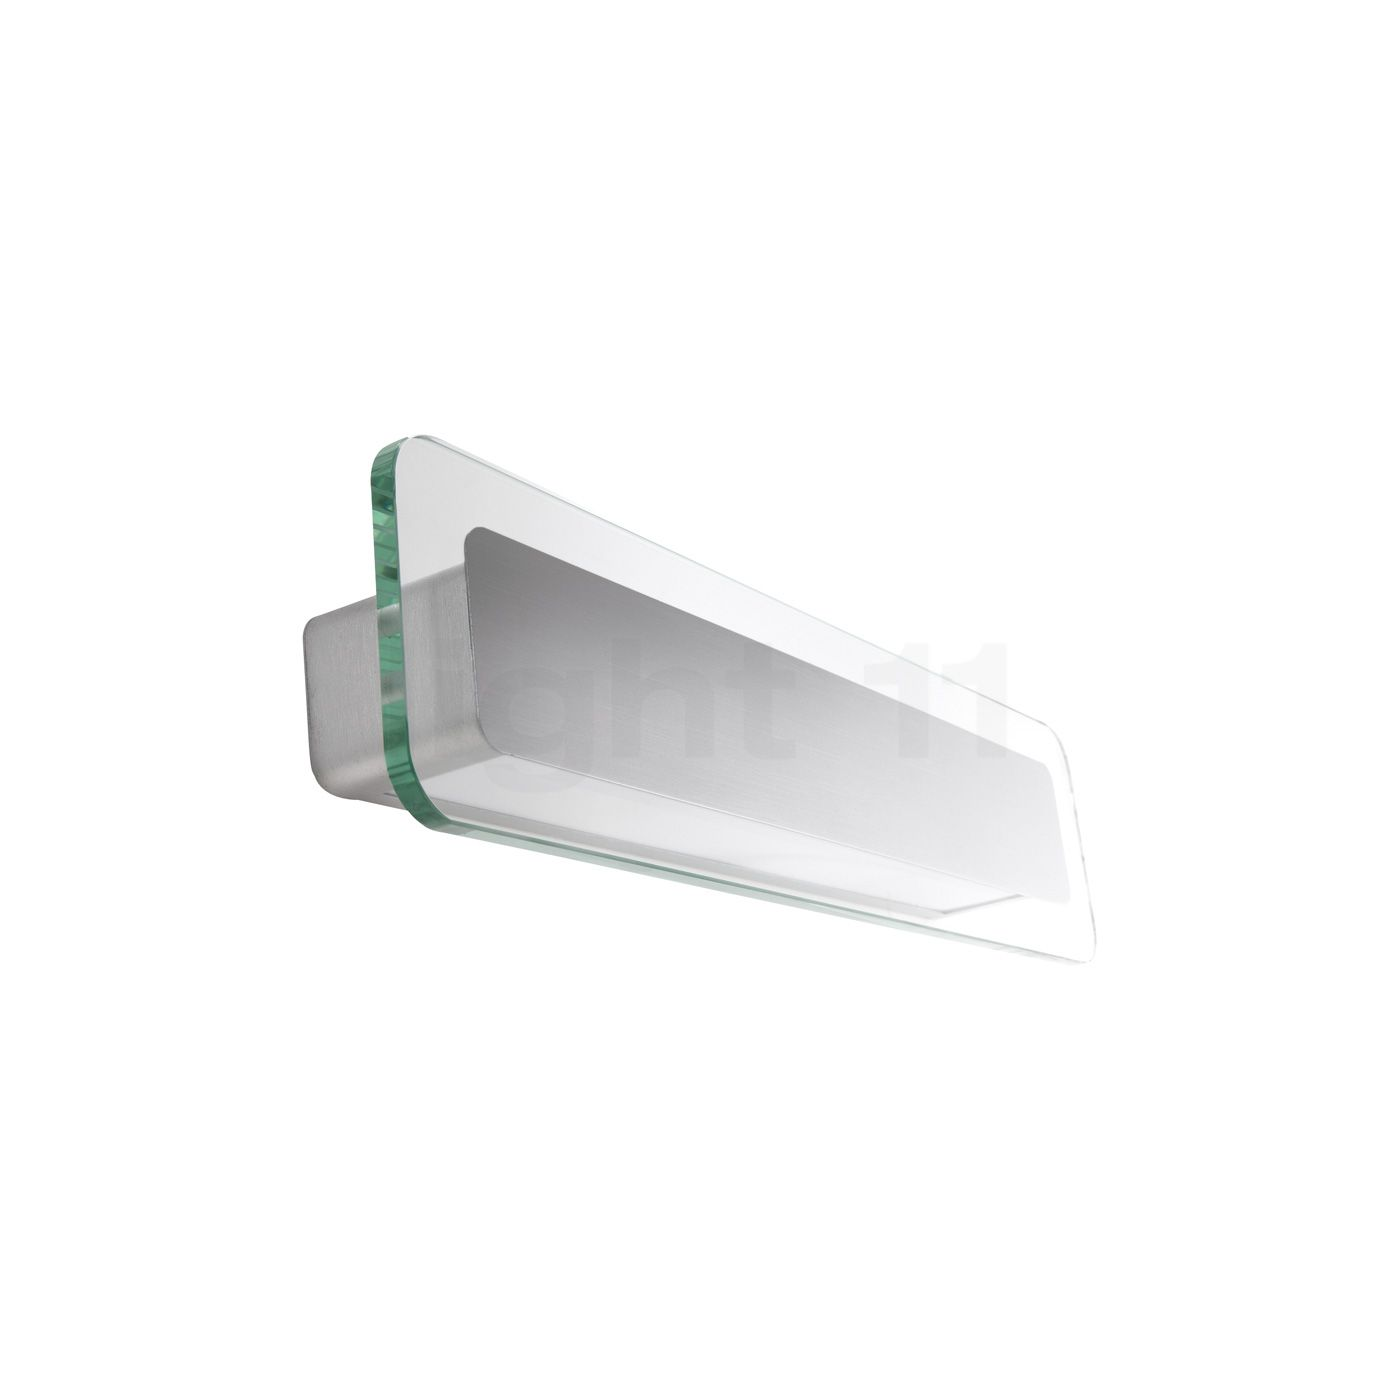 Philips Ecomoods Wall Lights : Philips Ecomoods Optimist Wall light 34103 Wall lights